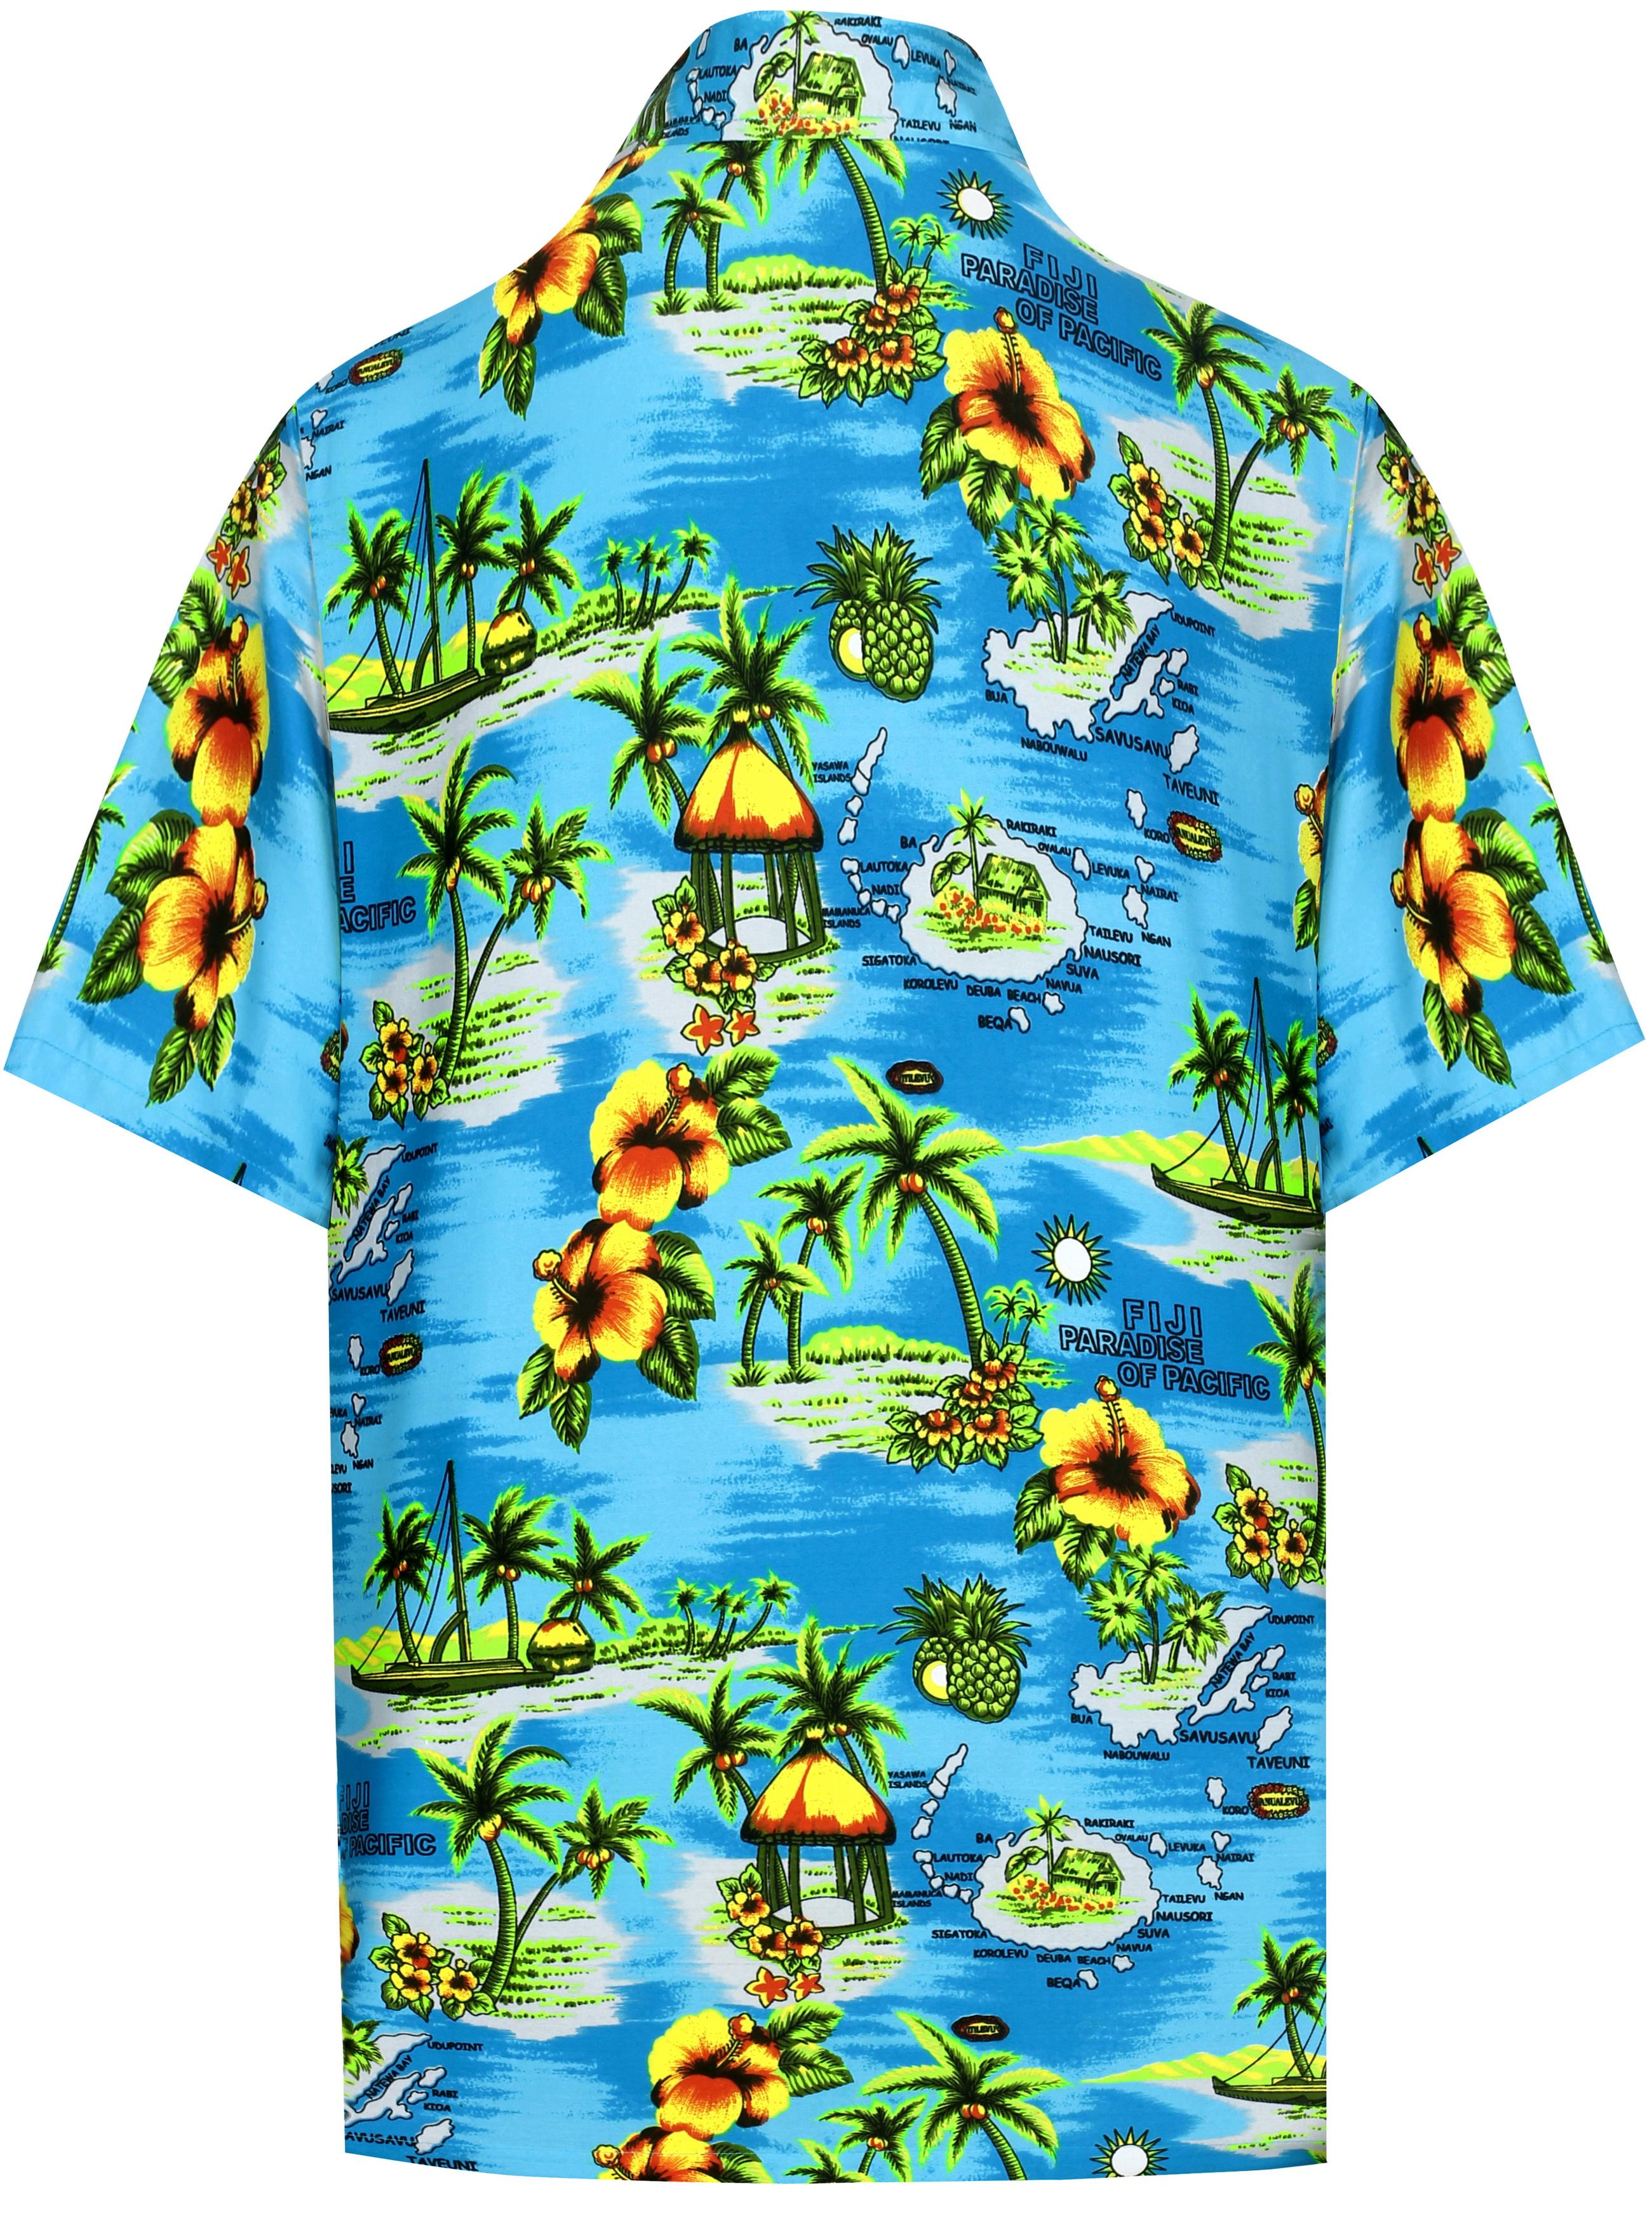 Indexbild 5 - Herren Hibiskus Palme Aloha Hawaii kurzen Ärmeln Knopfleiste Hawaii Shirt